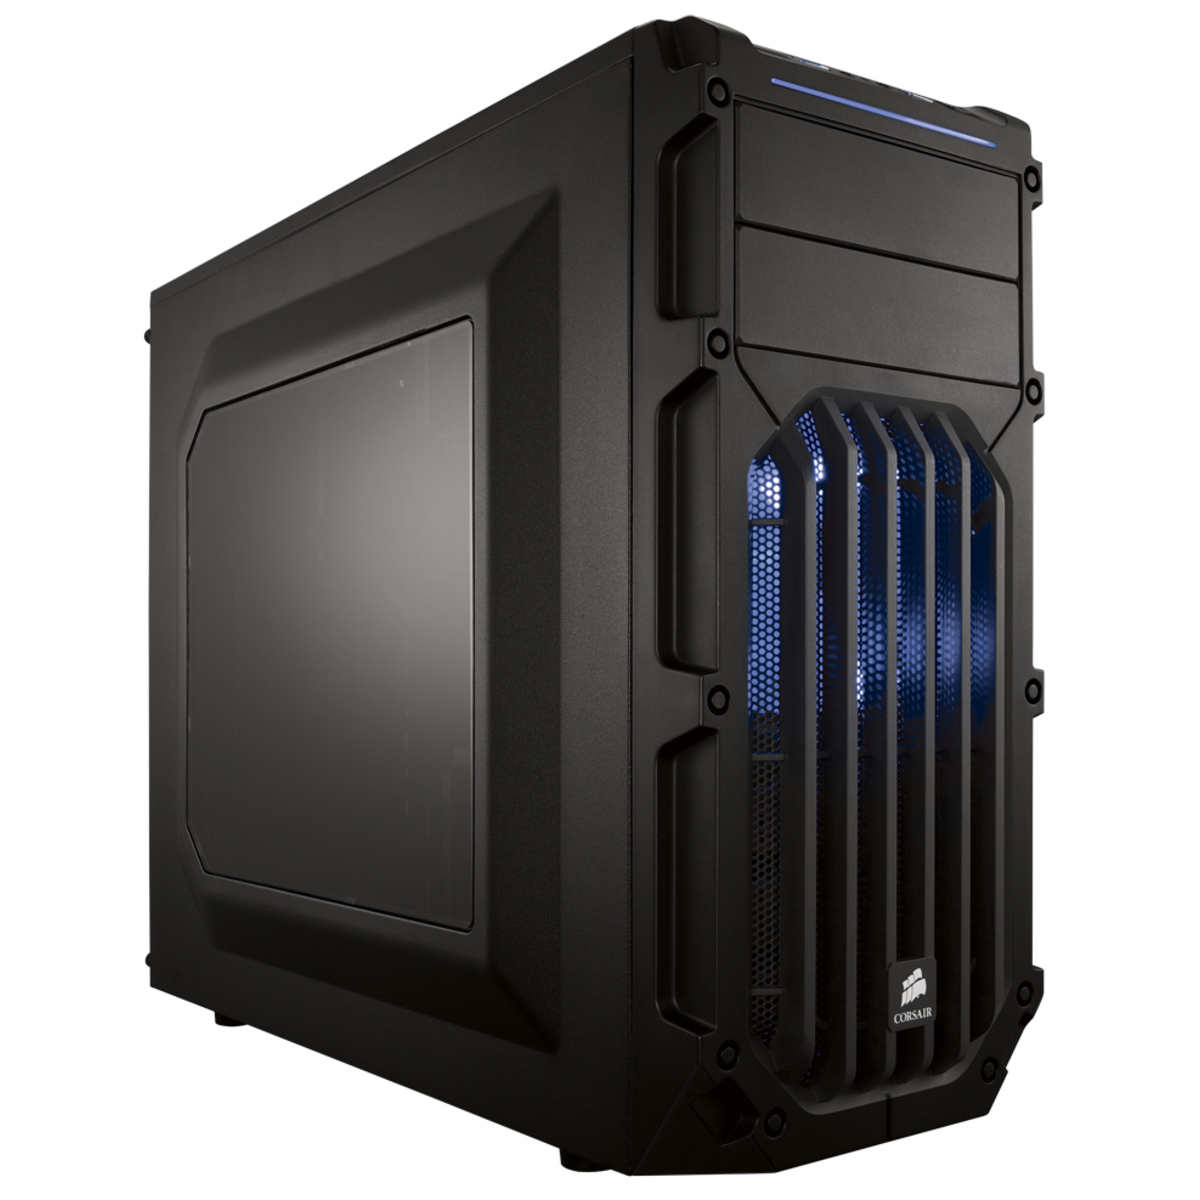 Corsair Carbide SPEC-03 Midi-Tower Black computer case